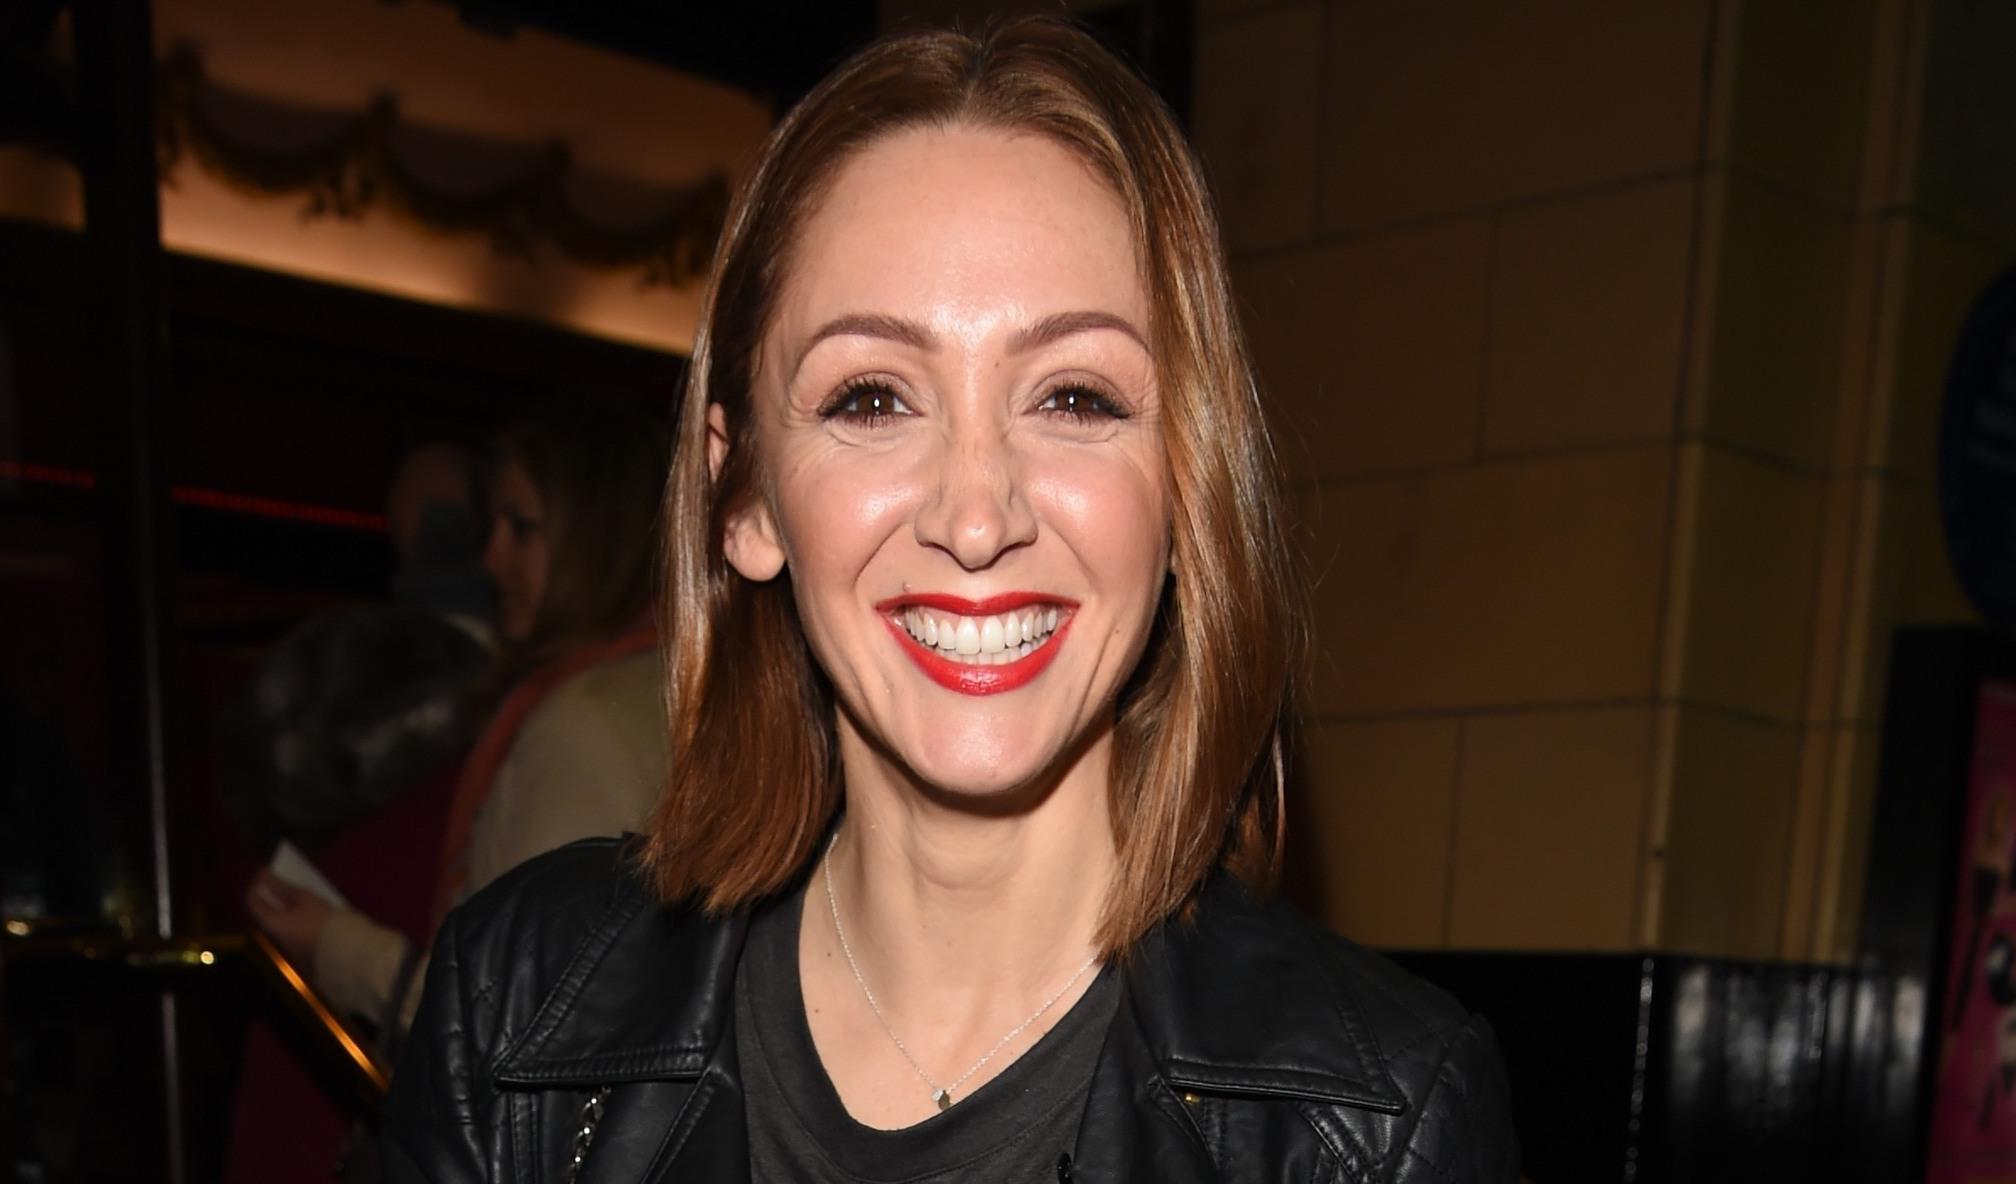 Lucy-Jo Hudson's partner seemingly responds to ex Alan Halsall's stinging social media comment